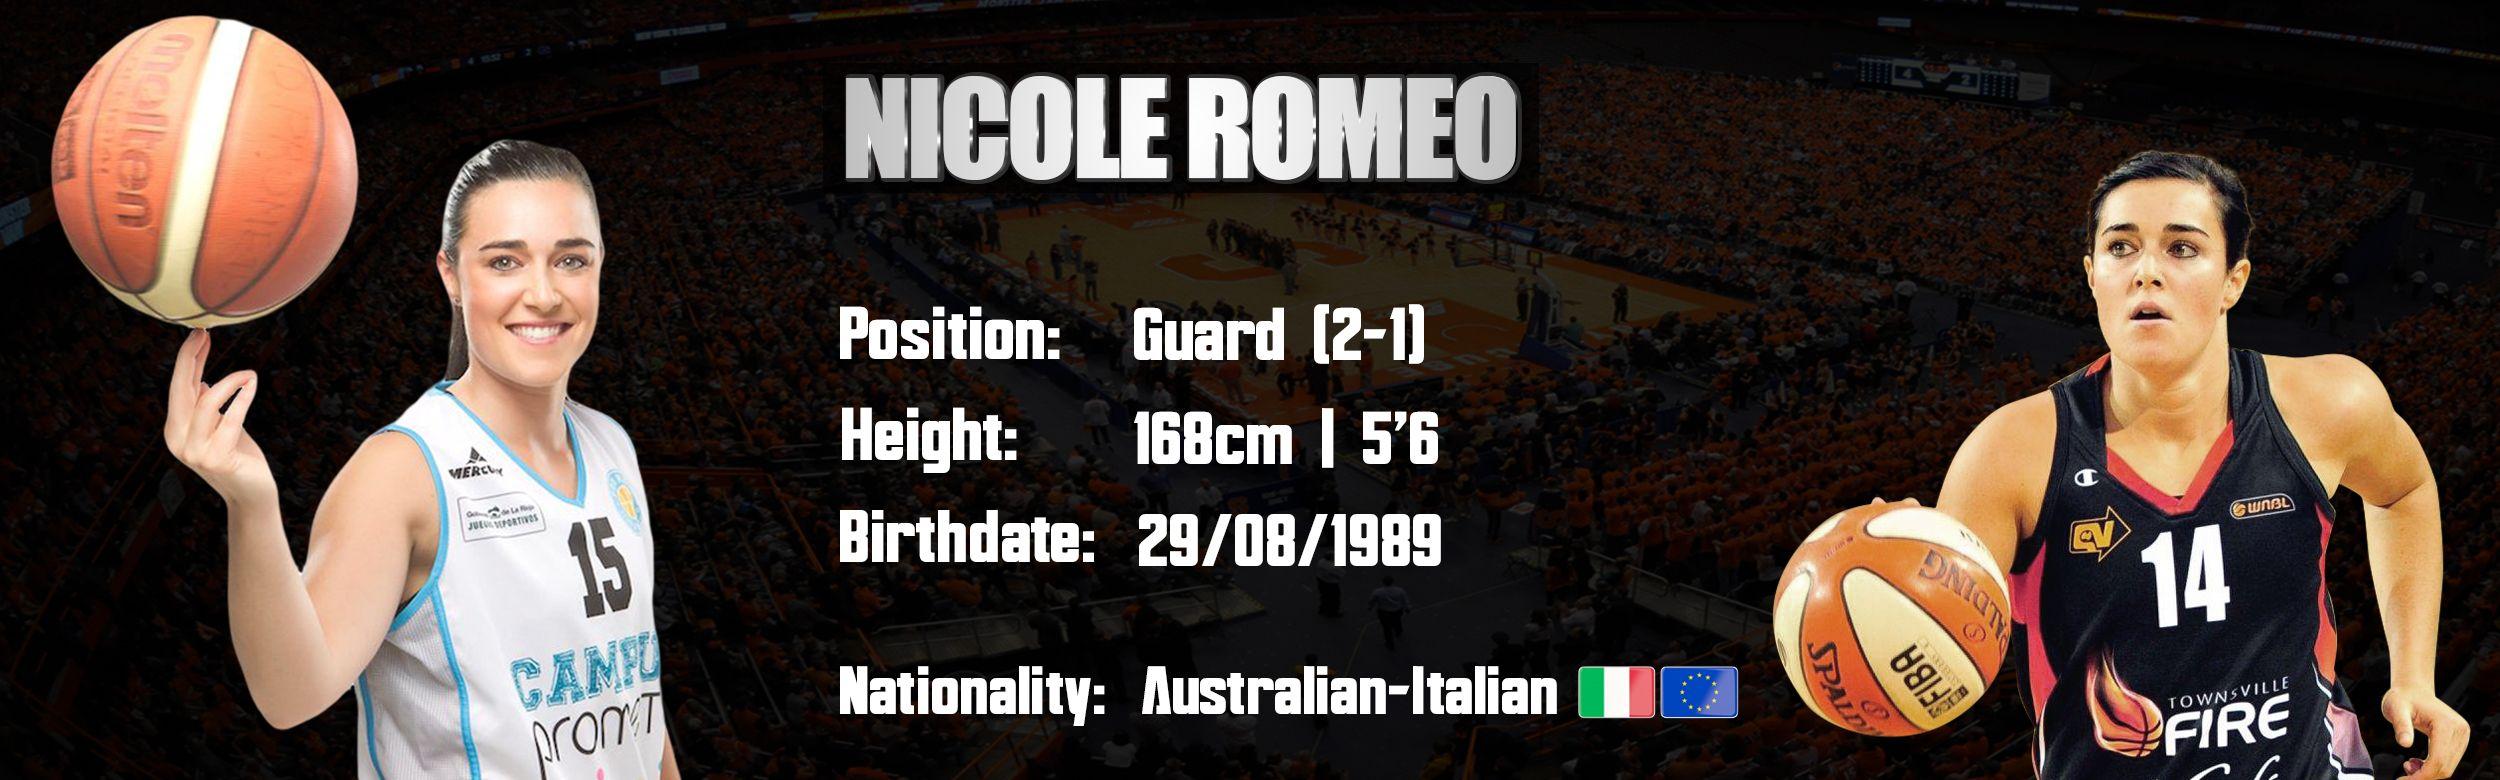 Nicole Romeo